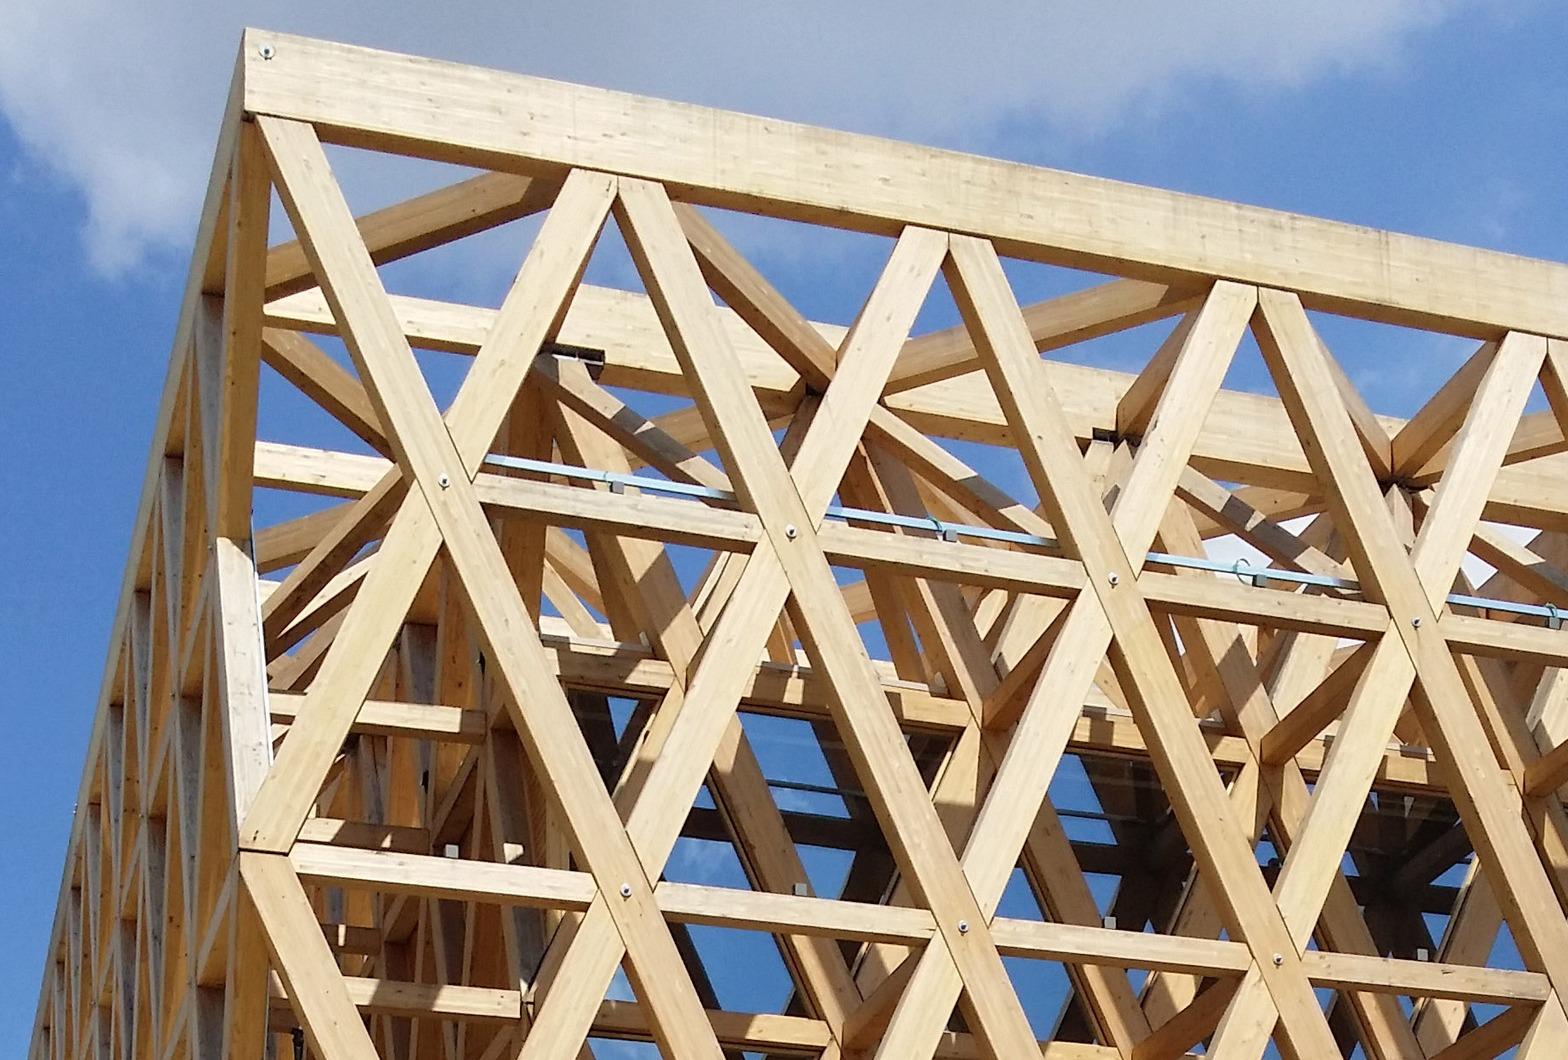 Materiales: Detalles Constructivos en Madera | Plataforma Arquitectura